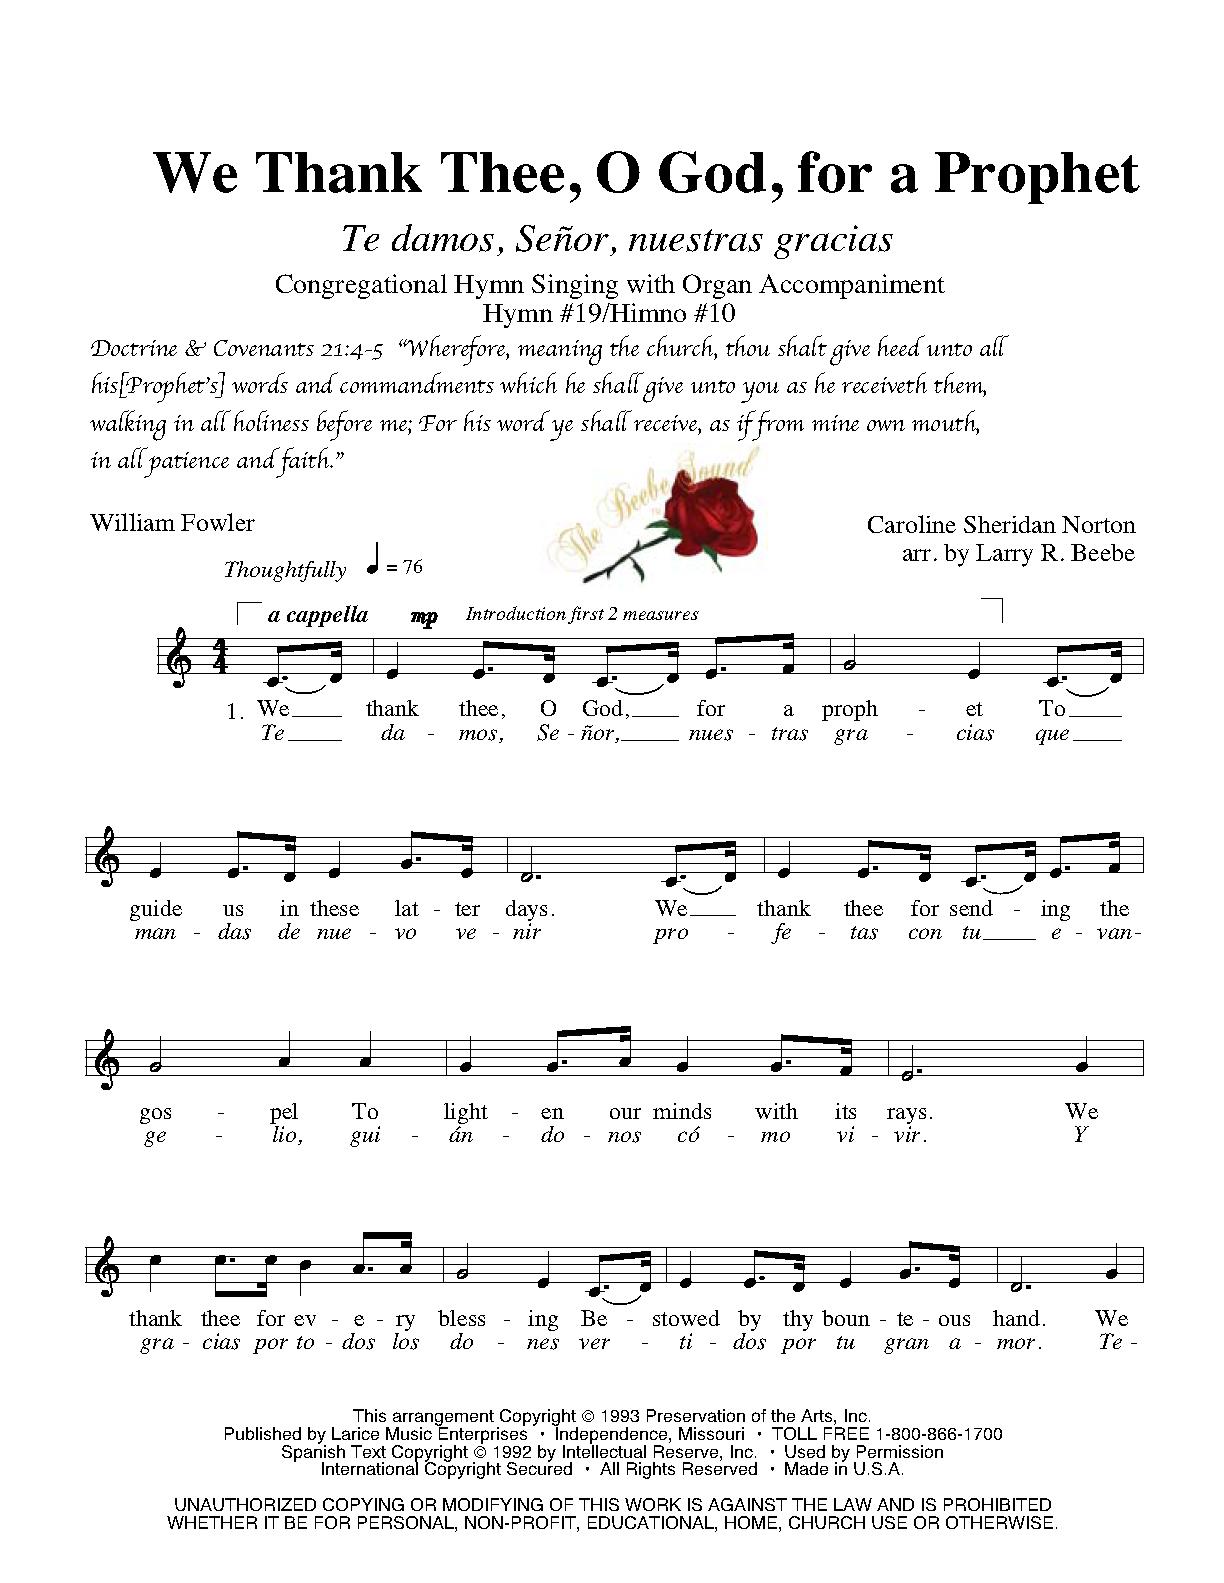 Hymns Of Worship Volume 5 Restoration Theme Lm4008